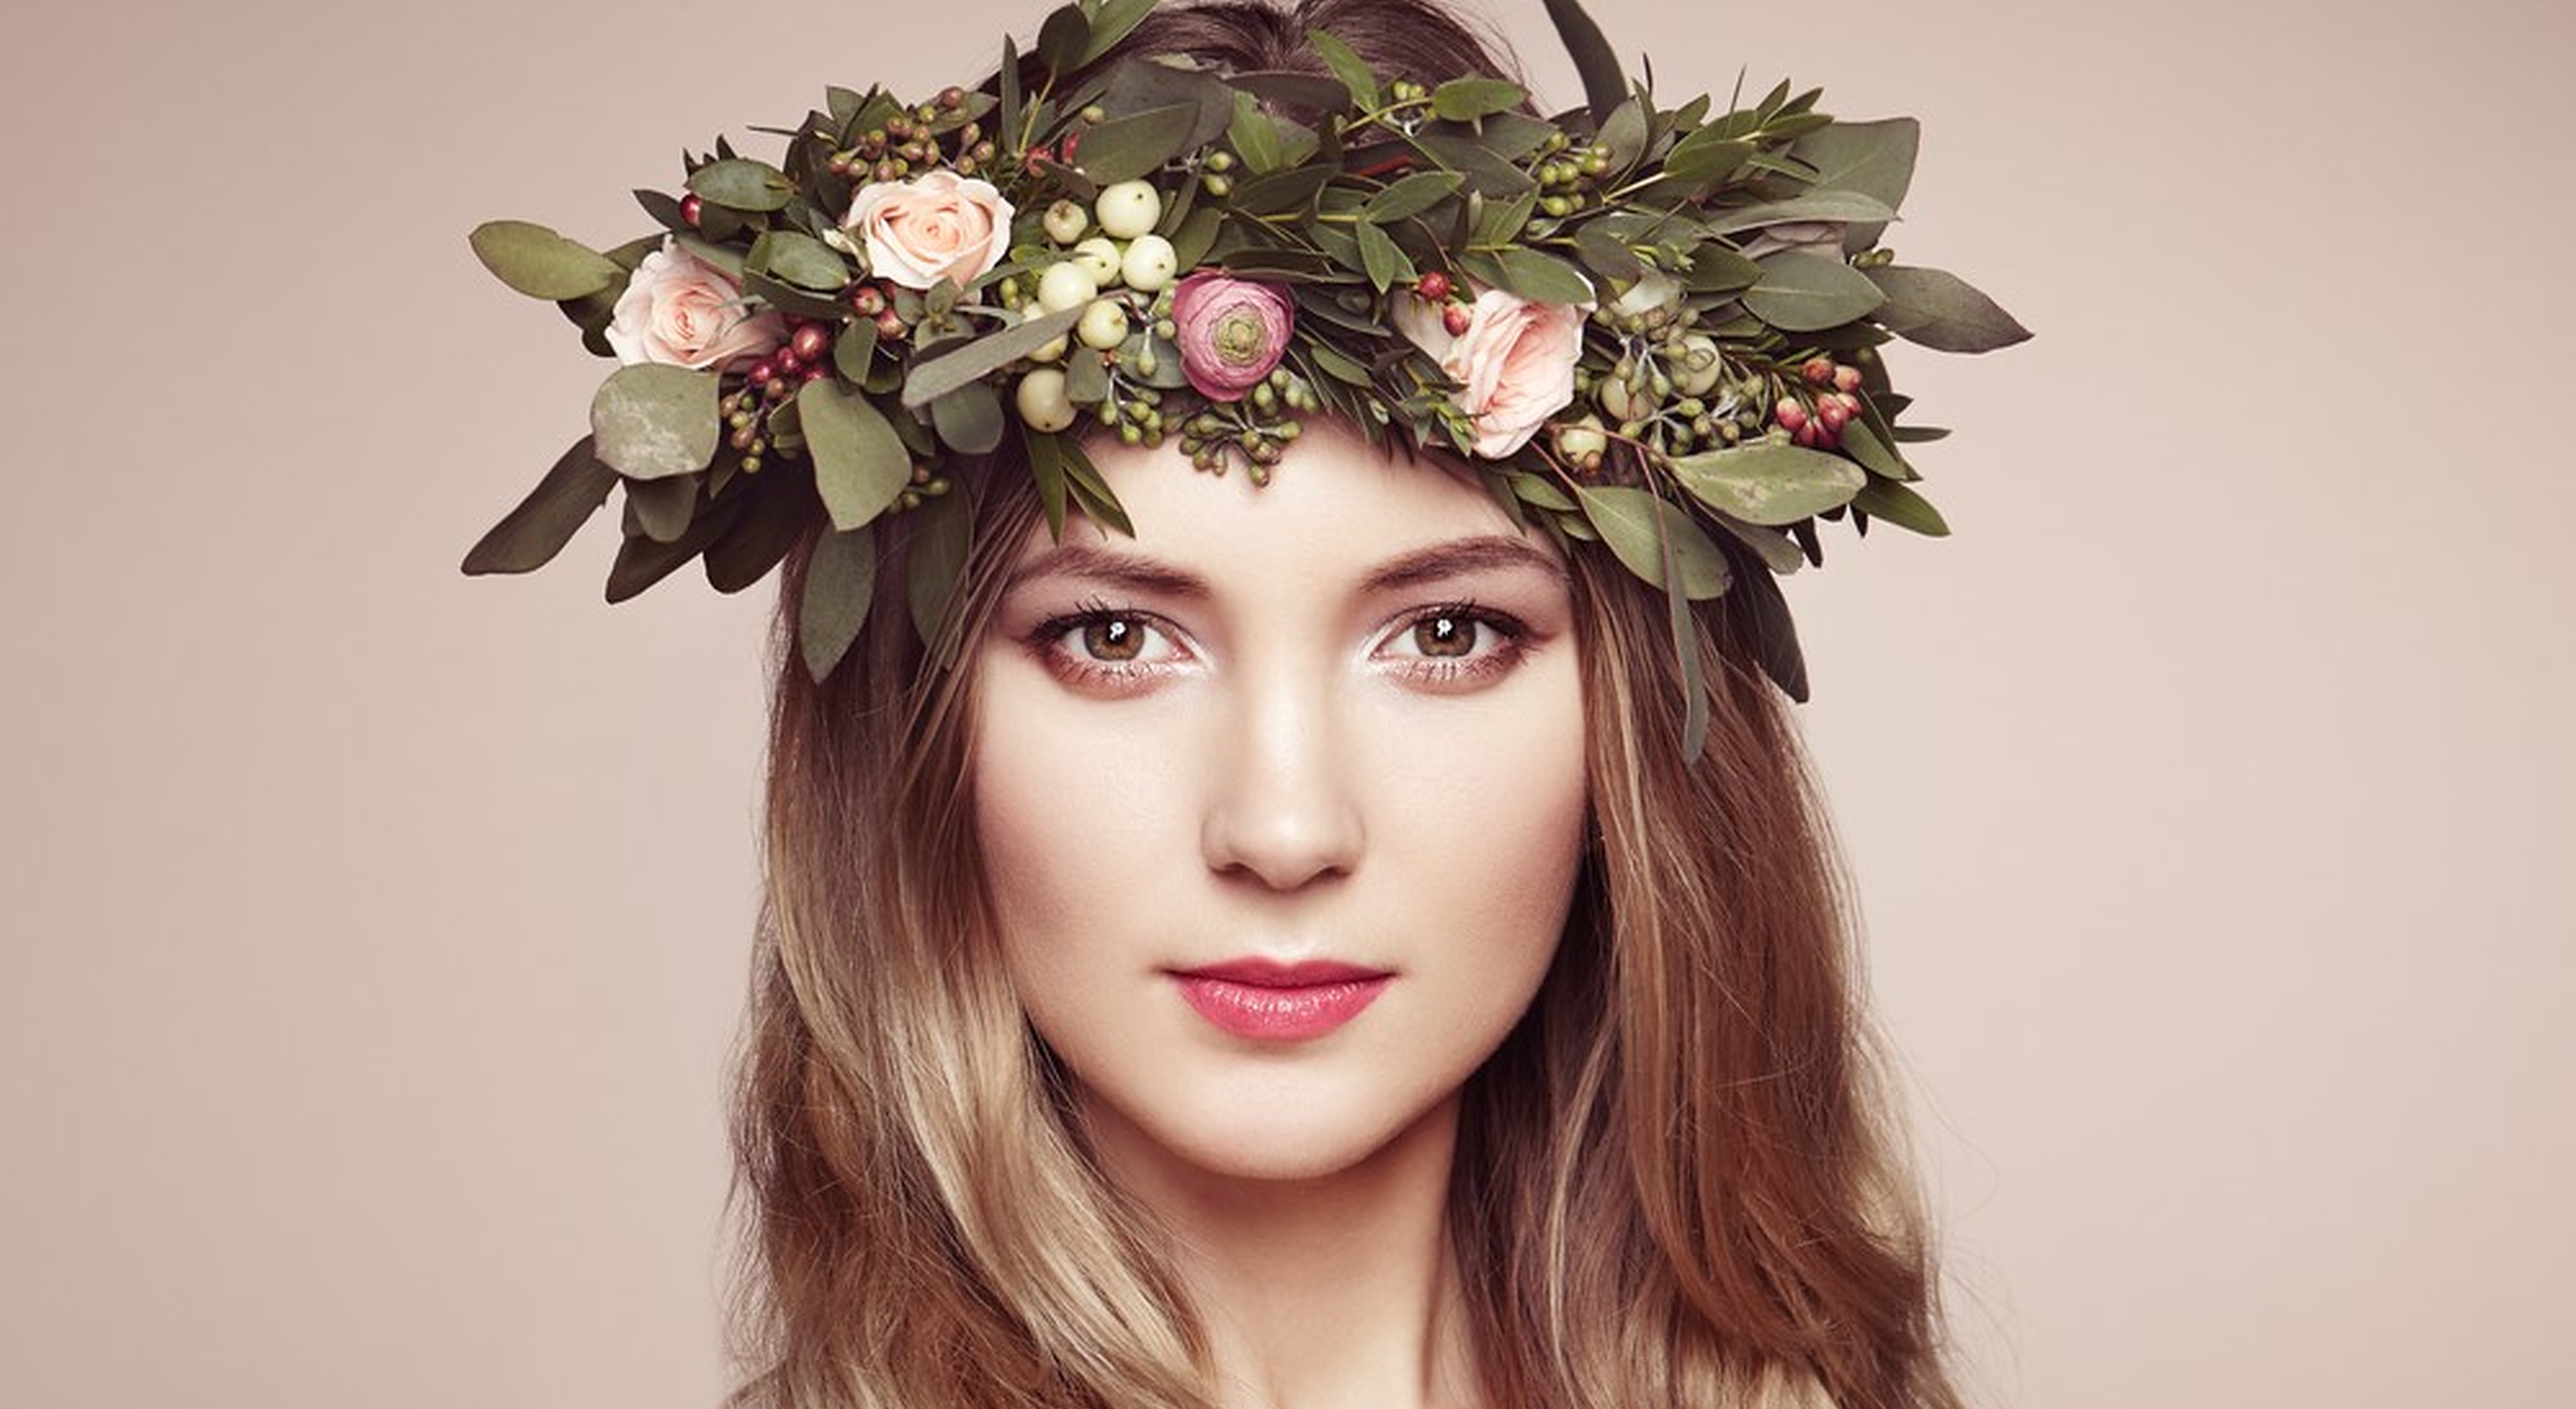 Boho Wedding Flower Crowns The Bridal Outlet